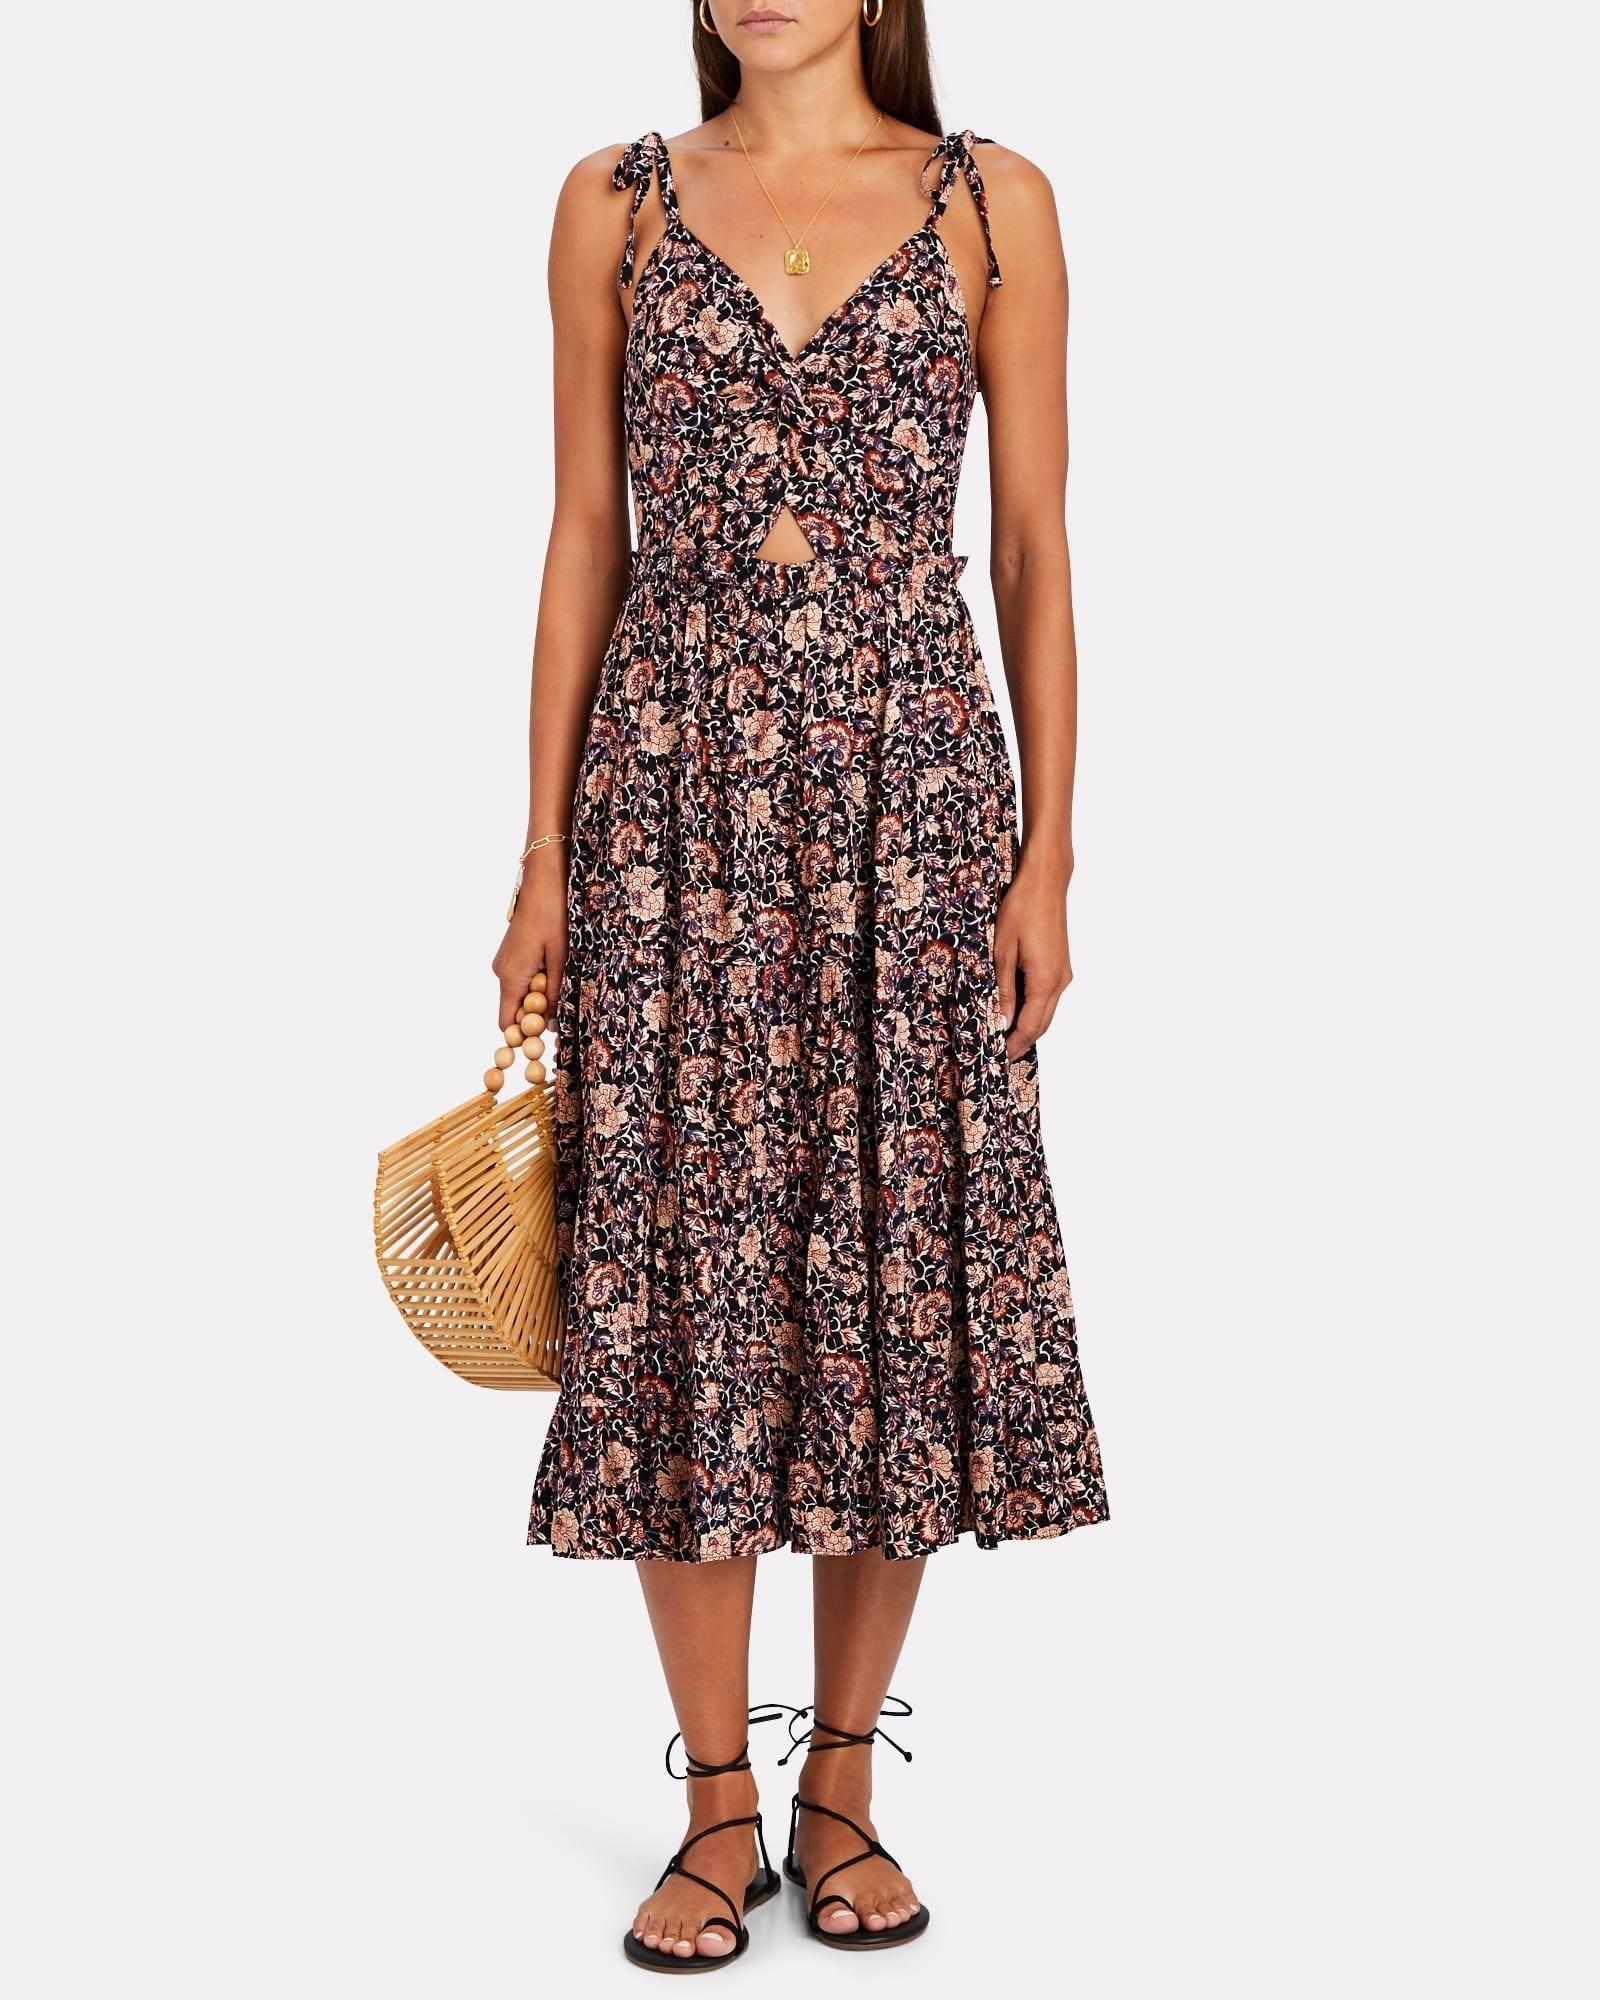 ULLA JOHNSON Kali Floral Cotton Midi Dress